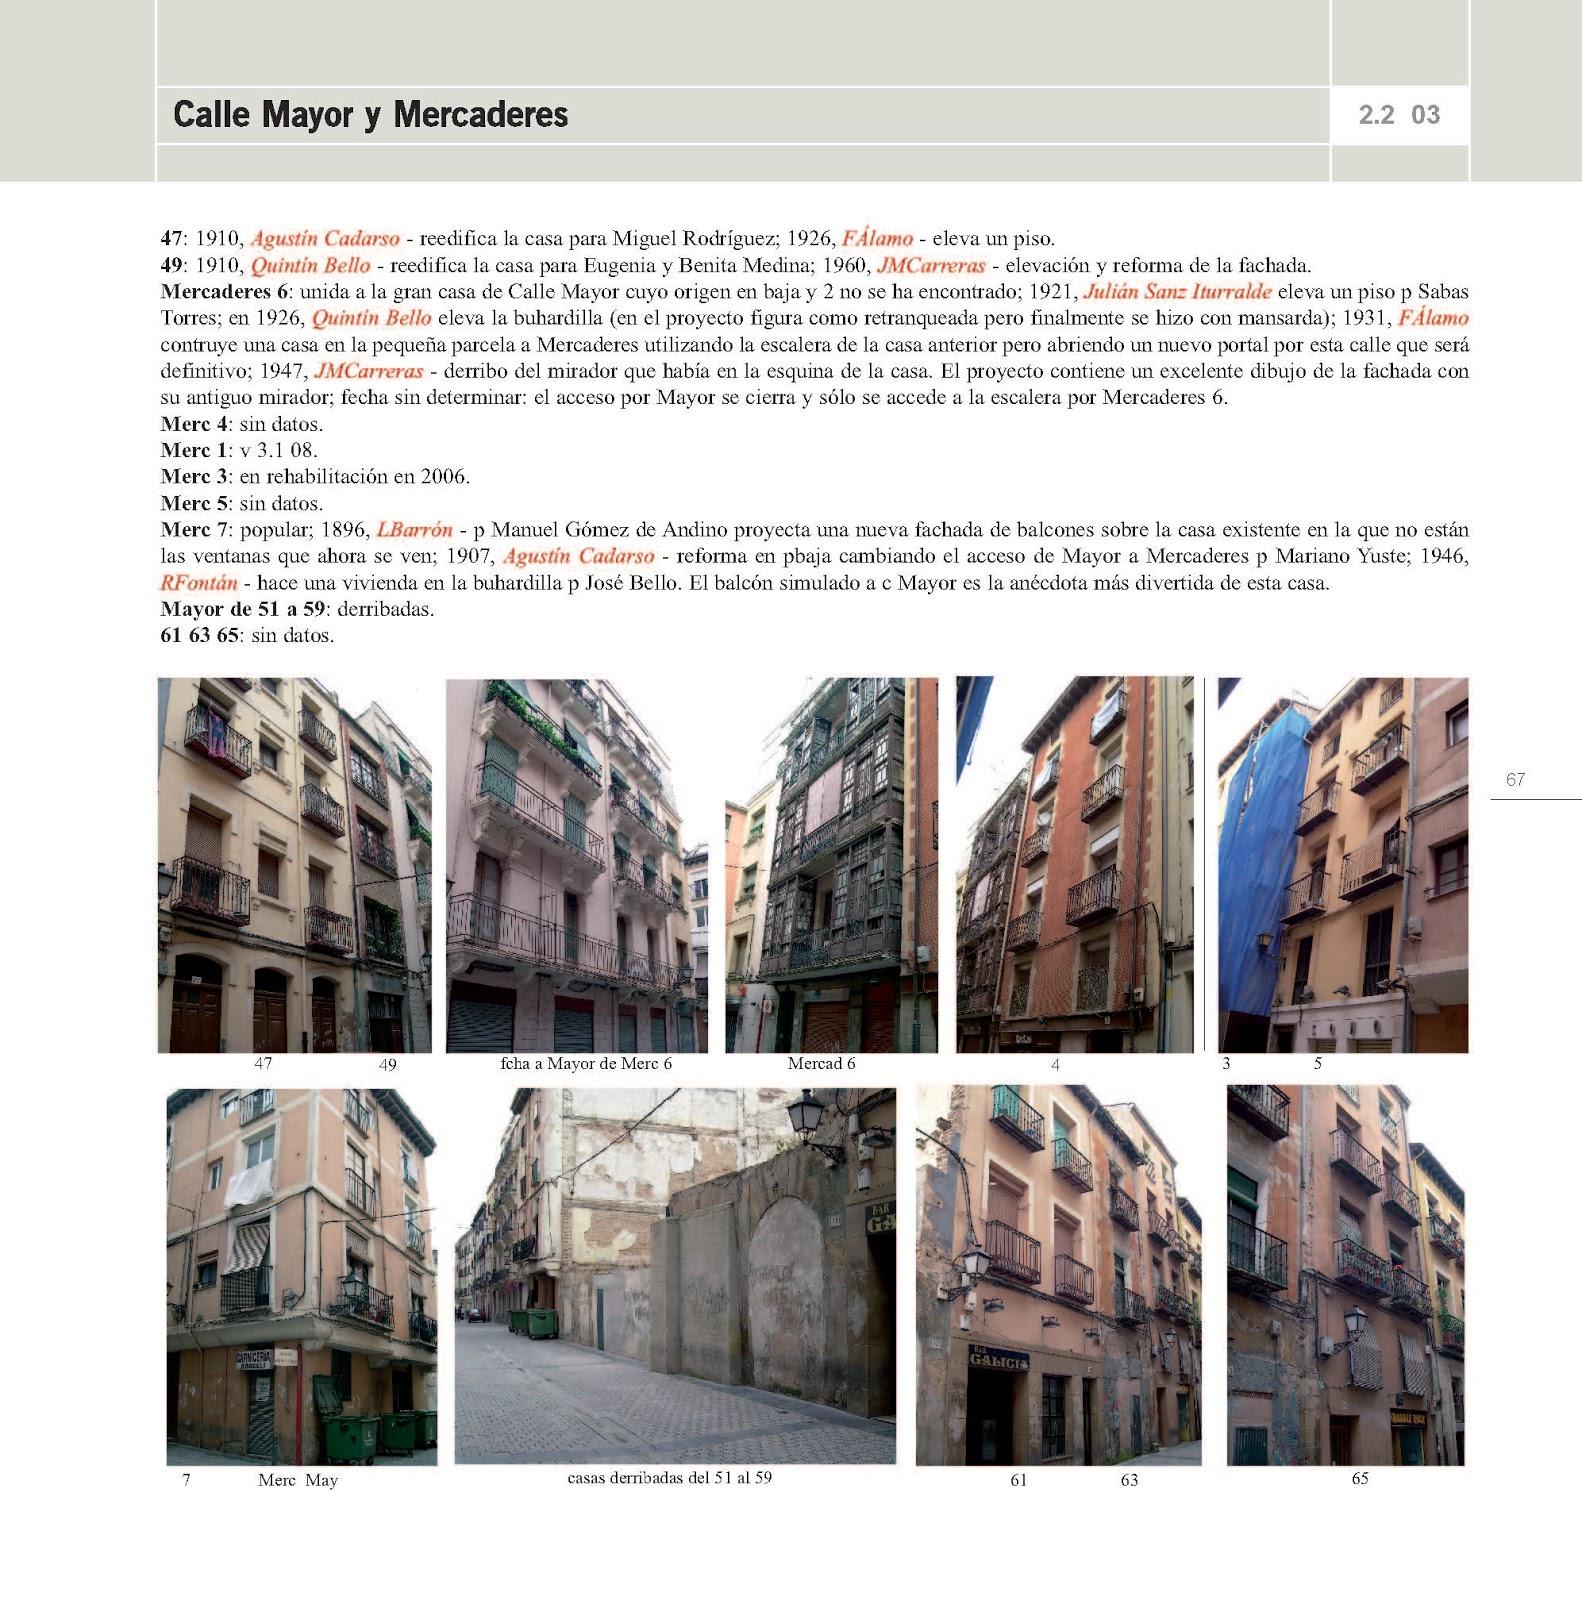 Guia de arquitectura de logro o paginas 2 2 03 calle for Paginas arquitectura